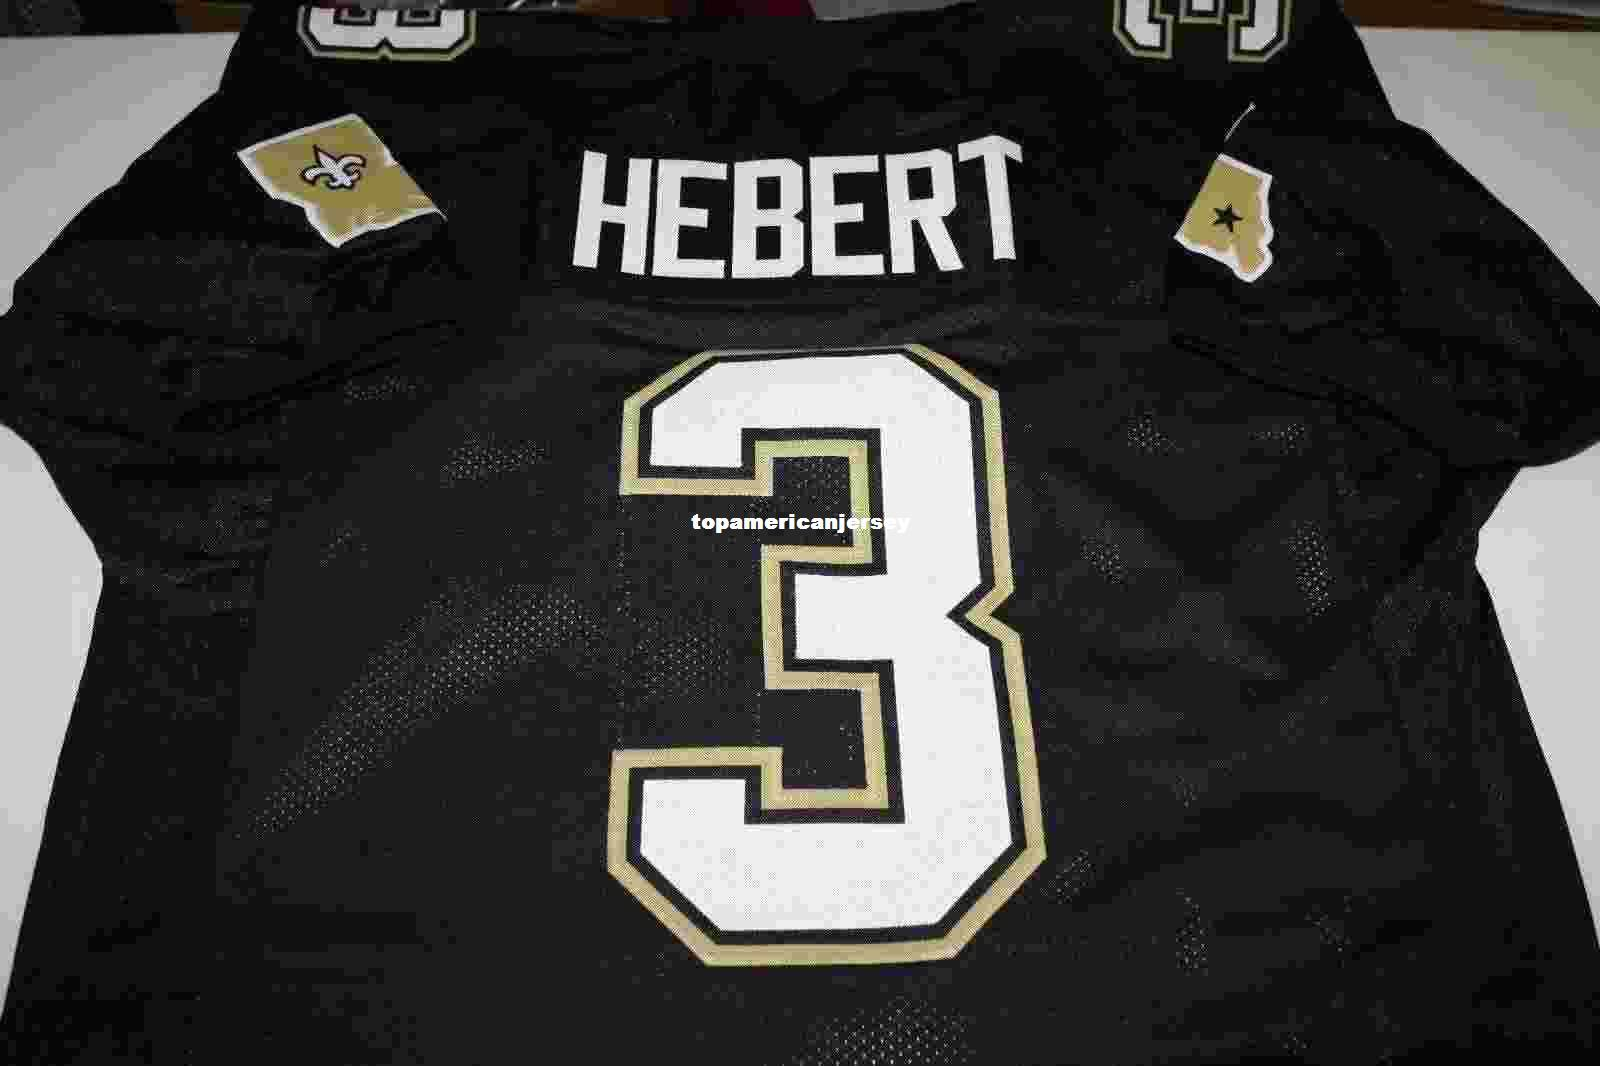 bobby hebert jersey